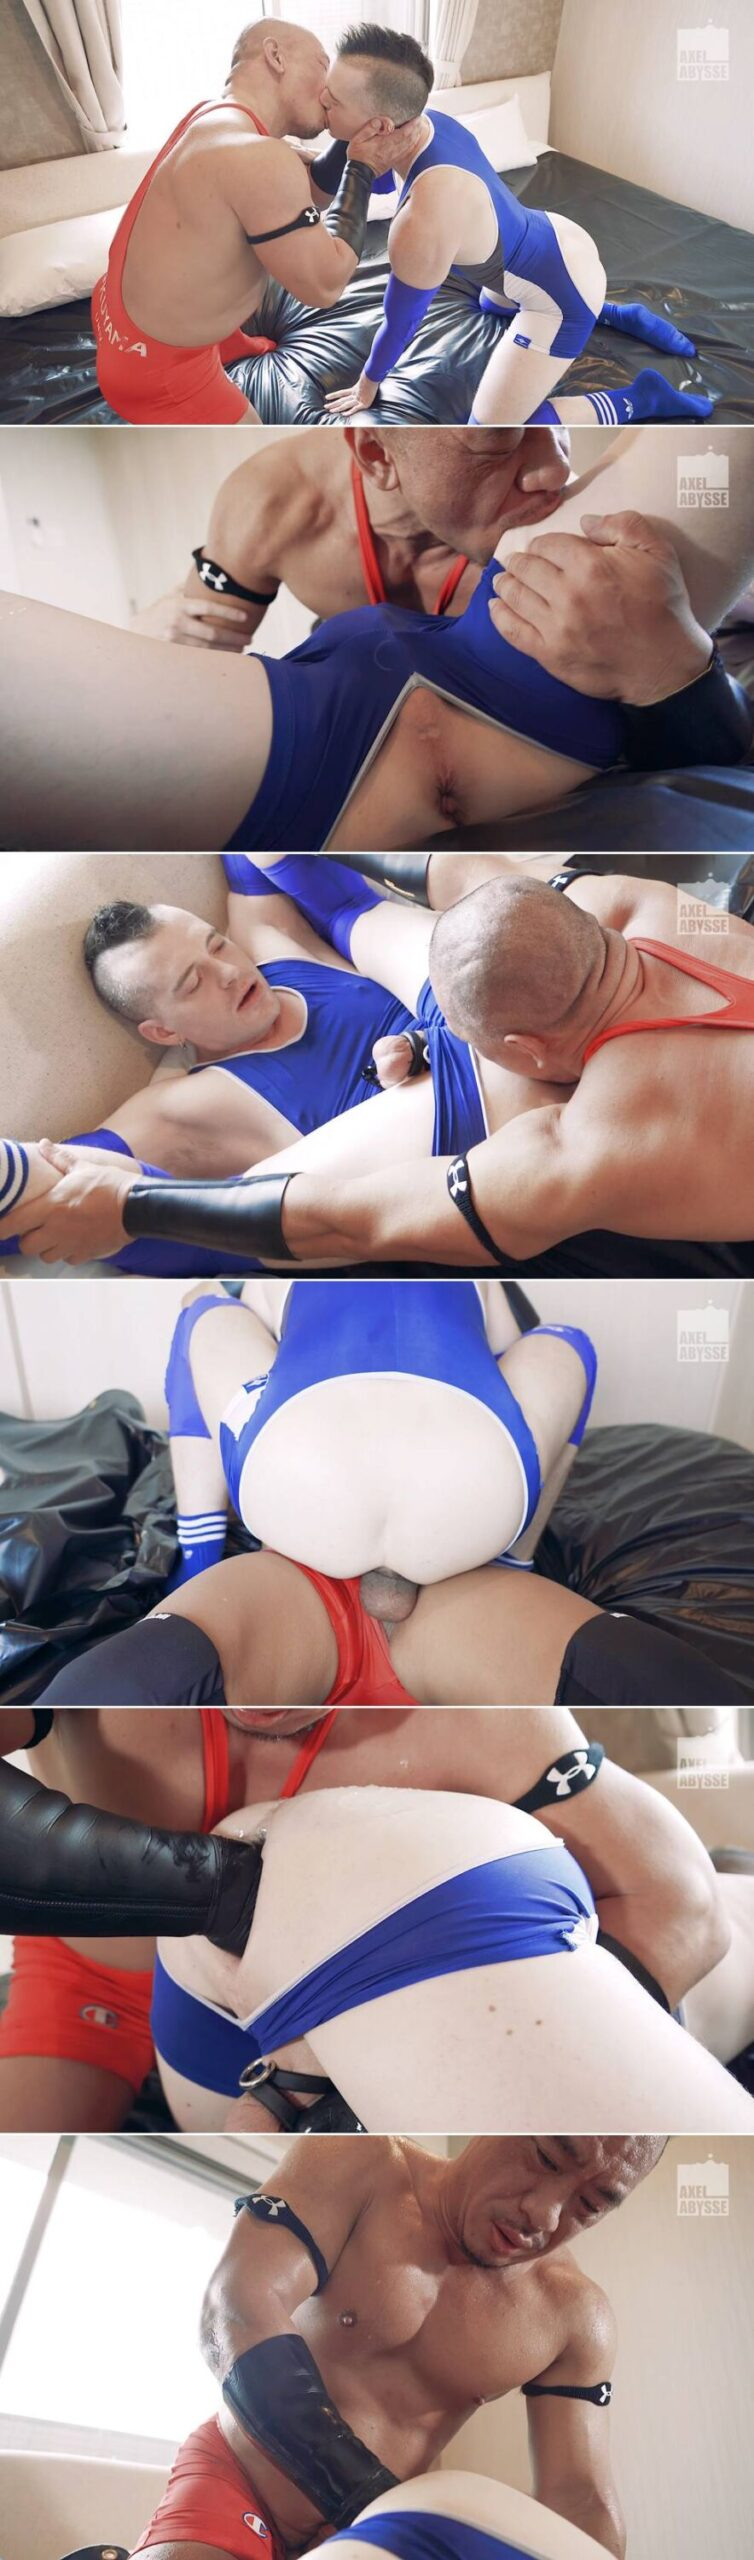 Syusaku & Axel Abysse - Wrestlers: Gay Fisting